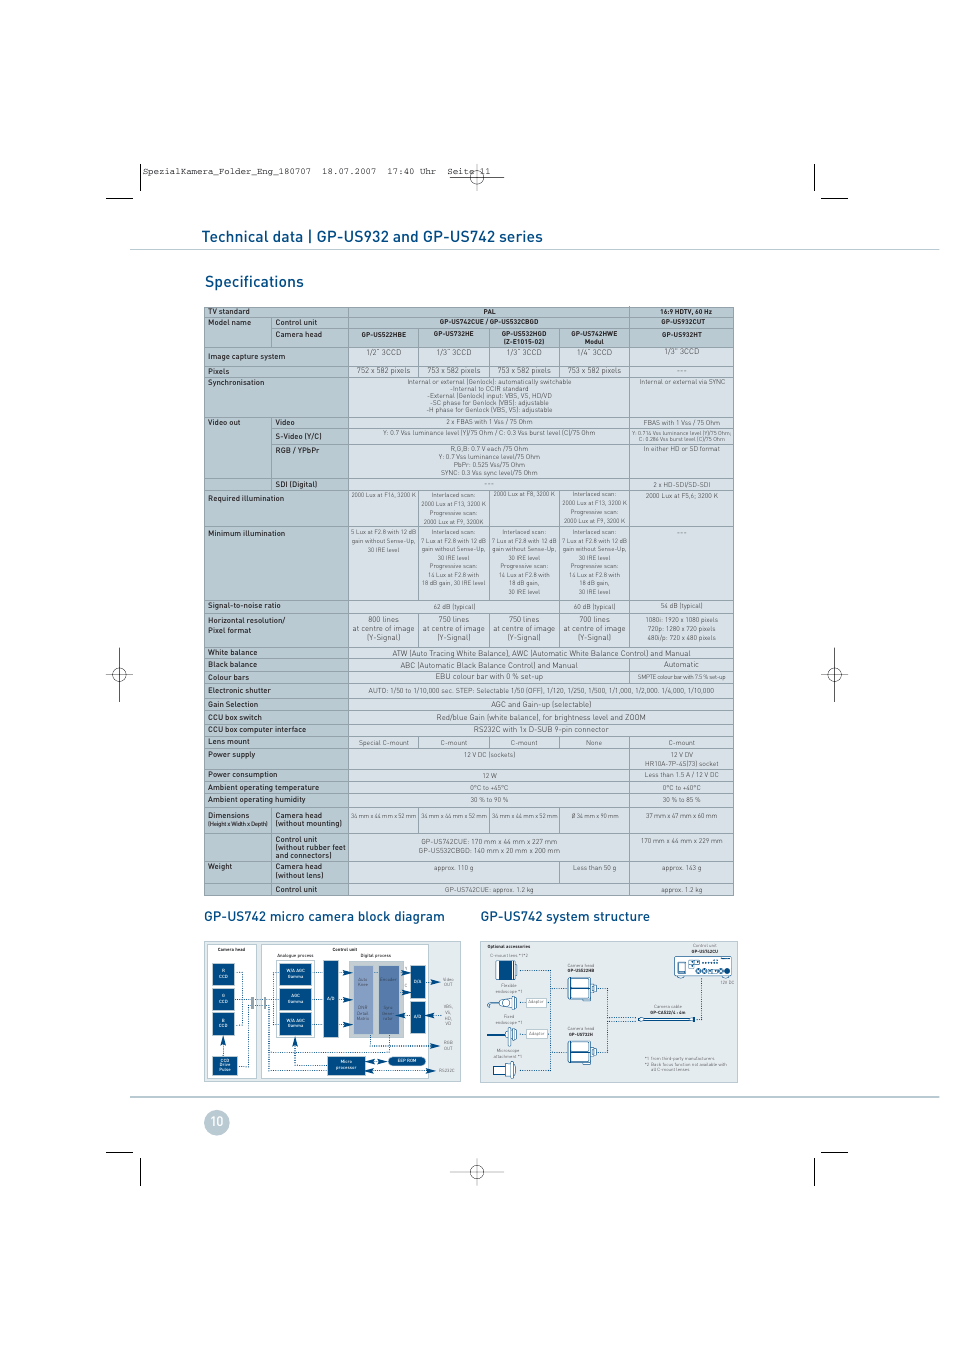 medium resolution of gp us742 system structure gp us742 micro camera block diagram panasonic gp